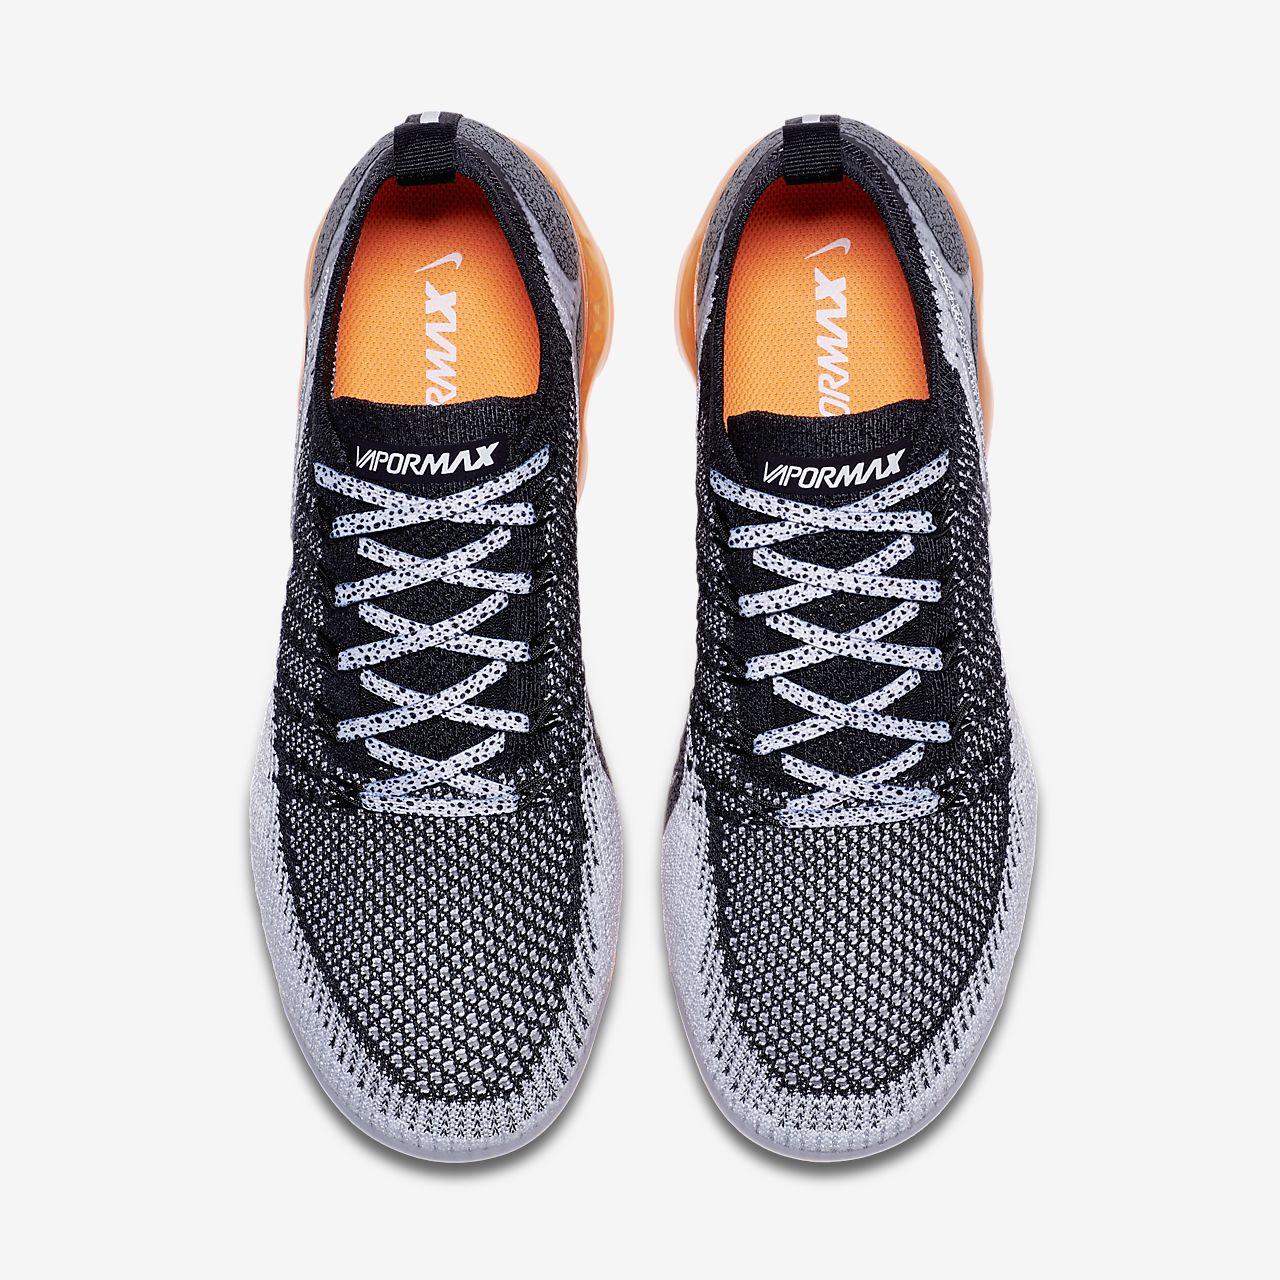 7769f4ecd0c5 Nike Air VaporMax Flyknit 2 Safari Zapatillas. Nike.com ES